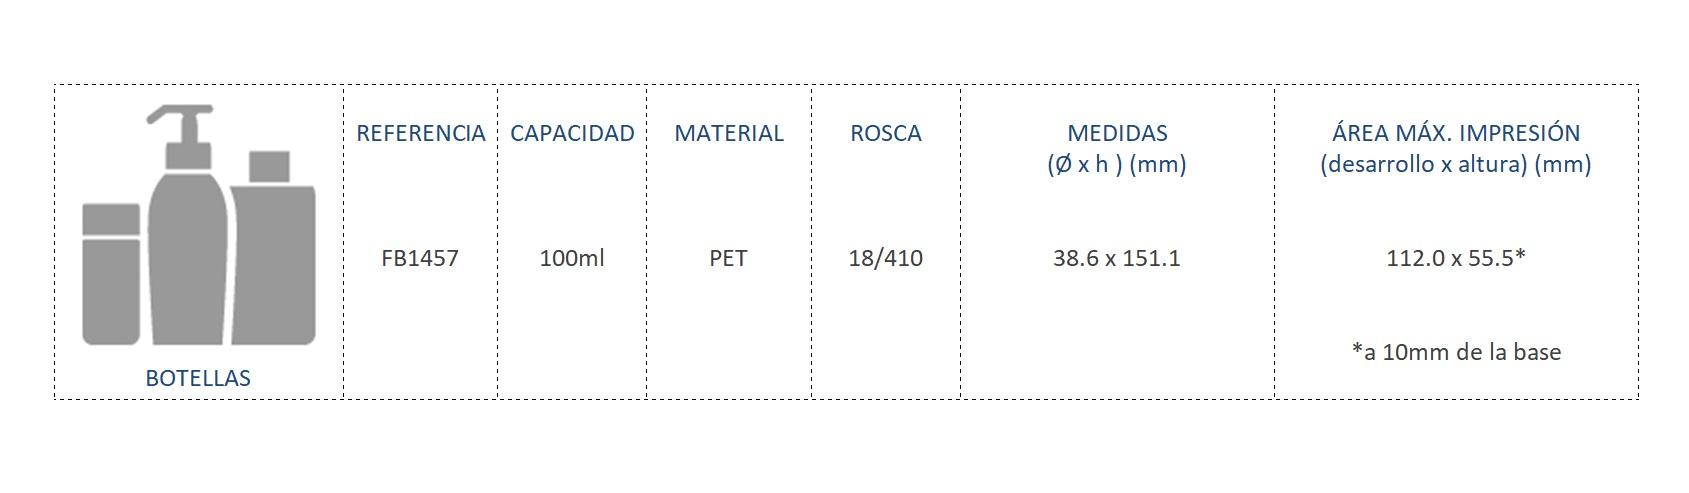 Cuadro de materiales FB1457